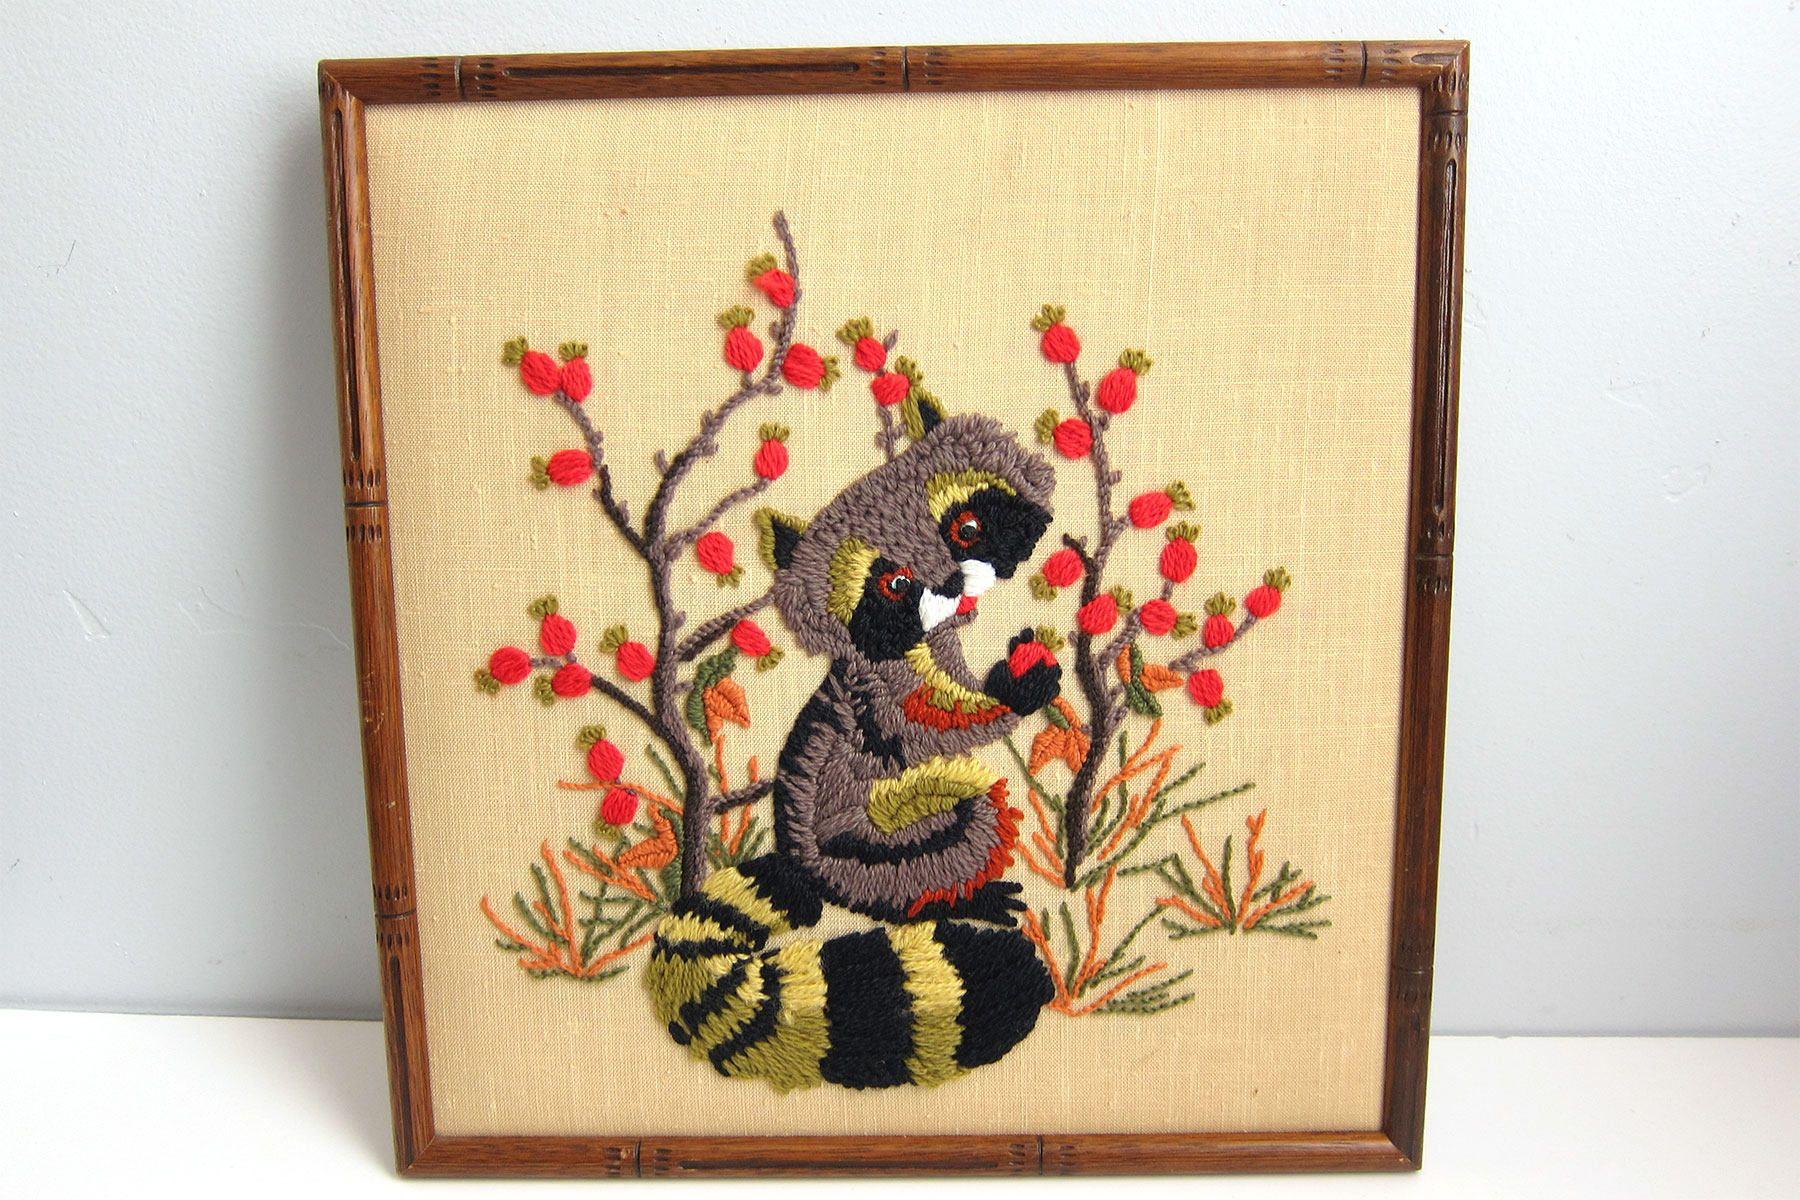 Vintage Cute Raccoon Apple Tree Crewel Embroidery Framed Wall Art ...